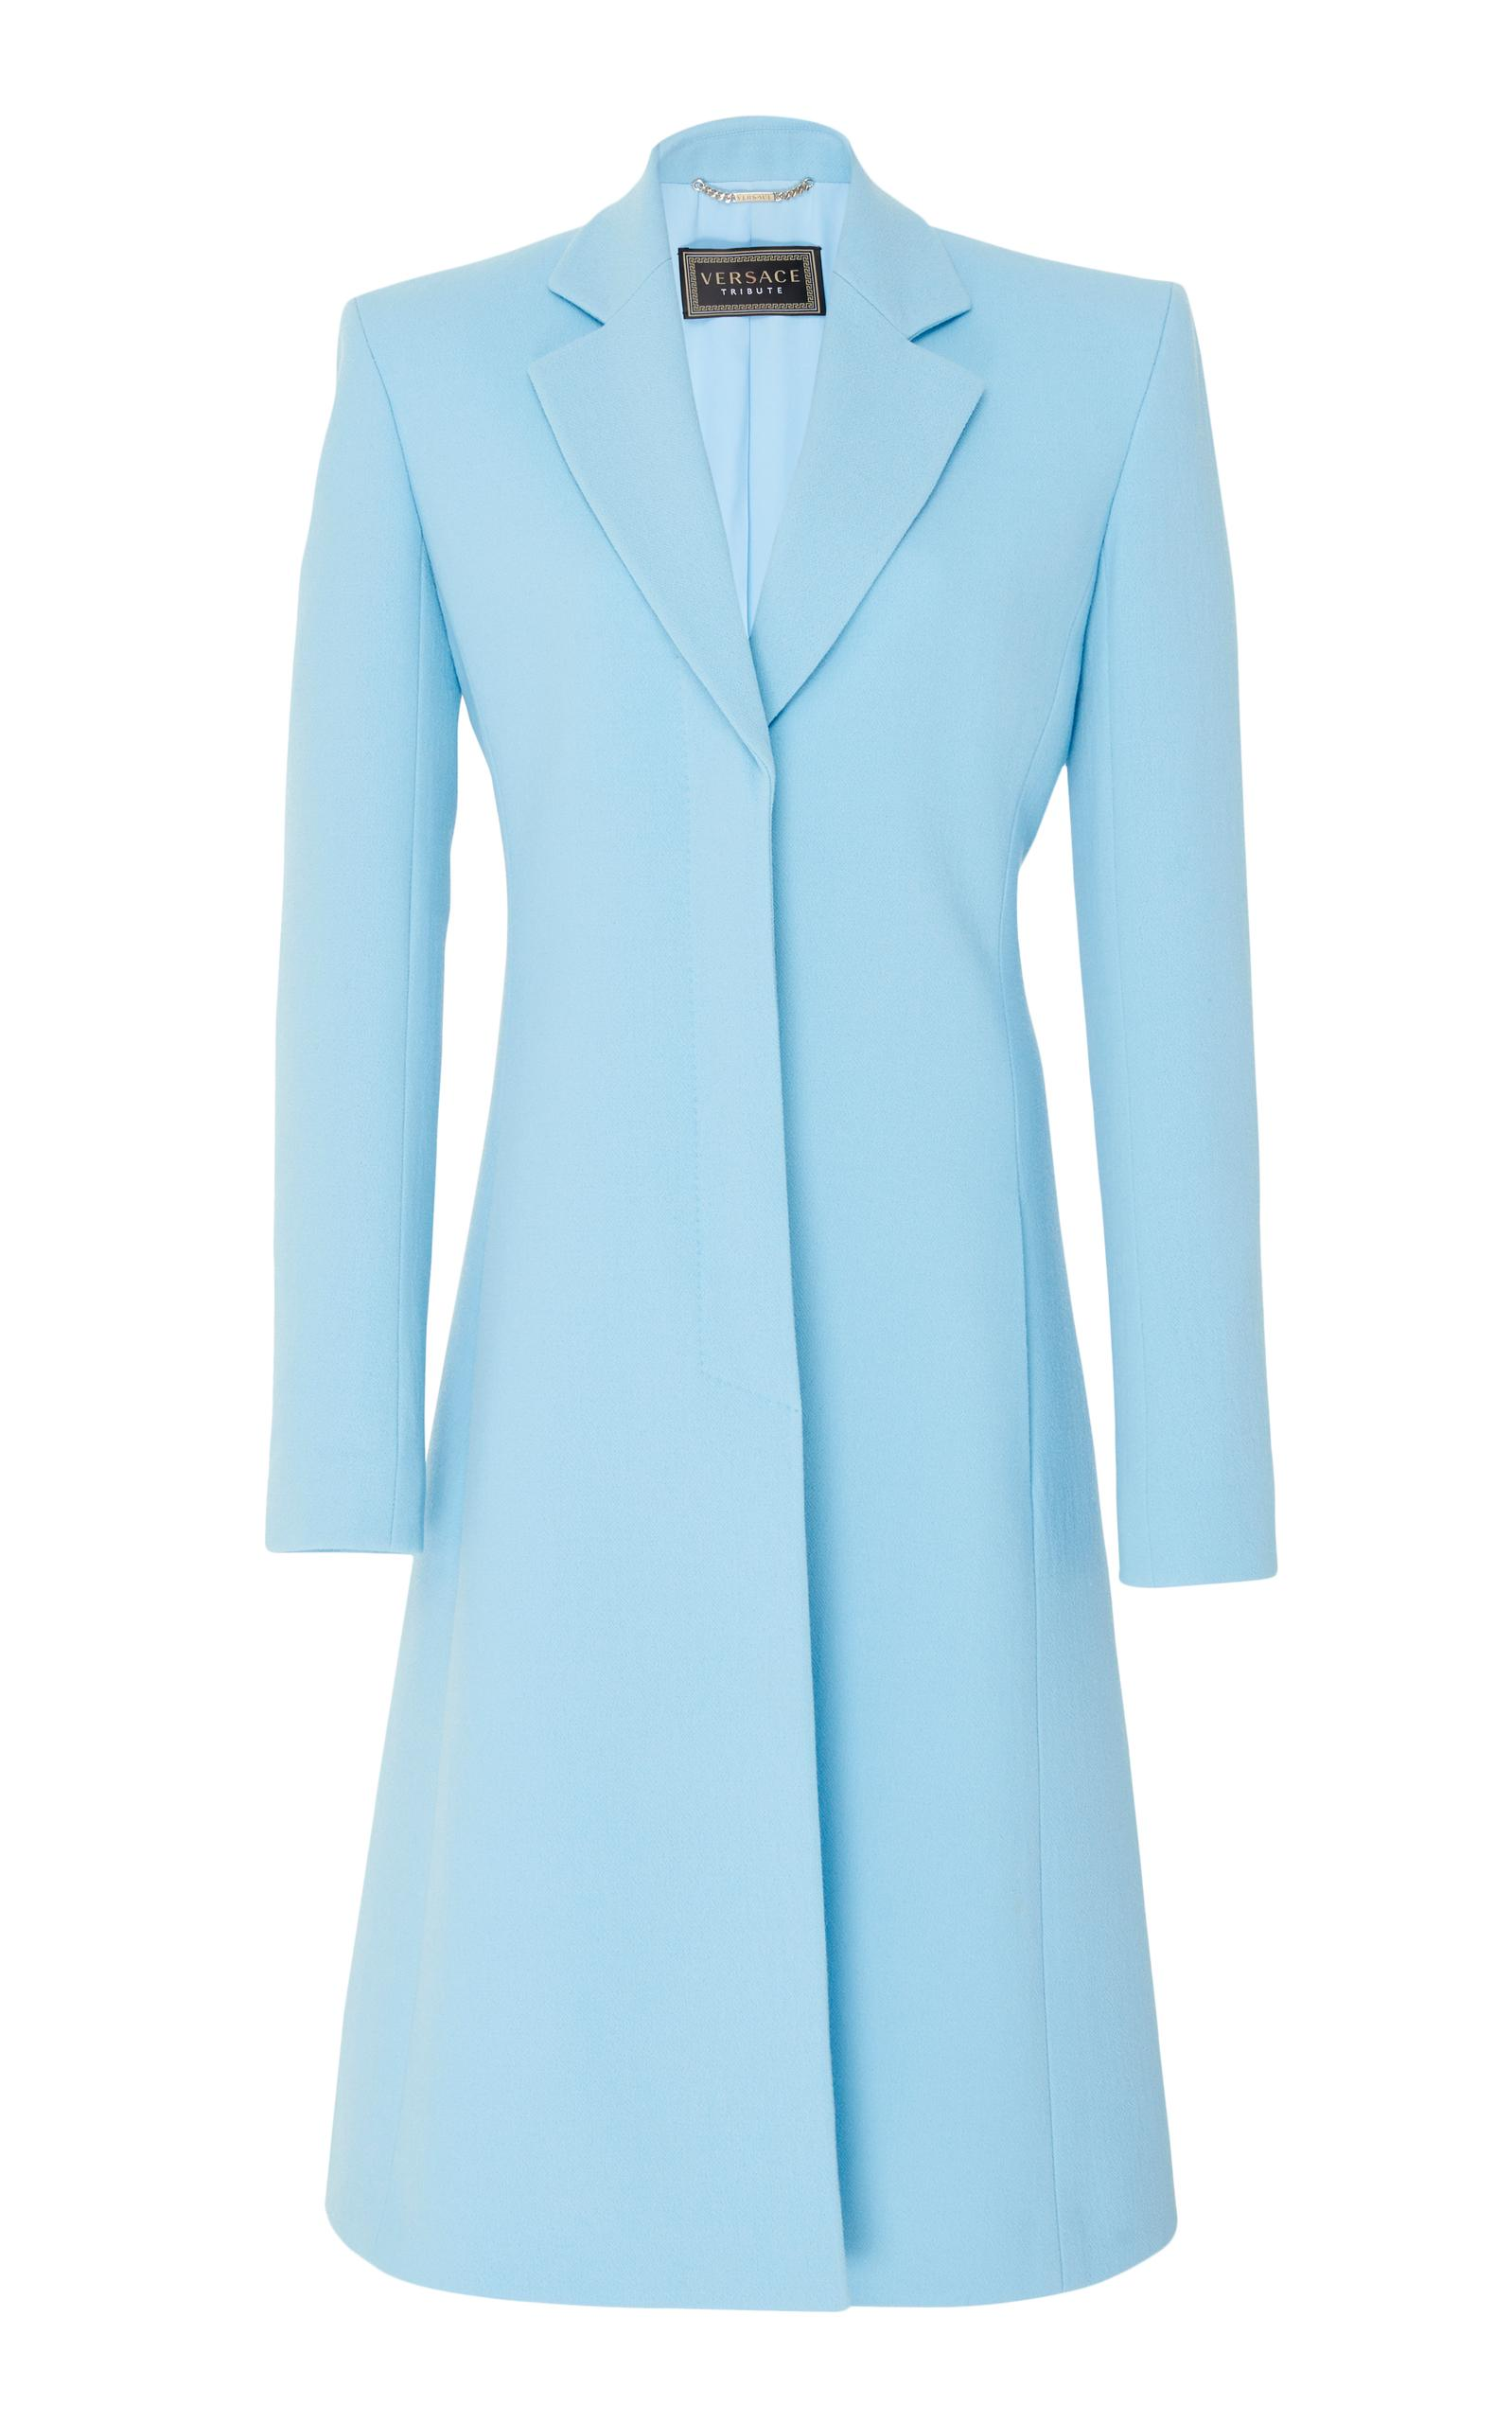 Versace A-Line Crepe Coat In Blue